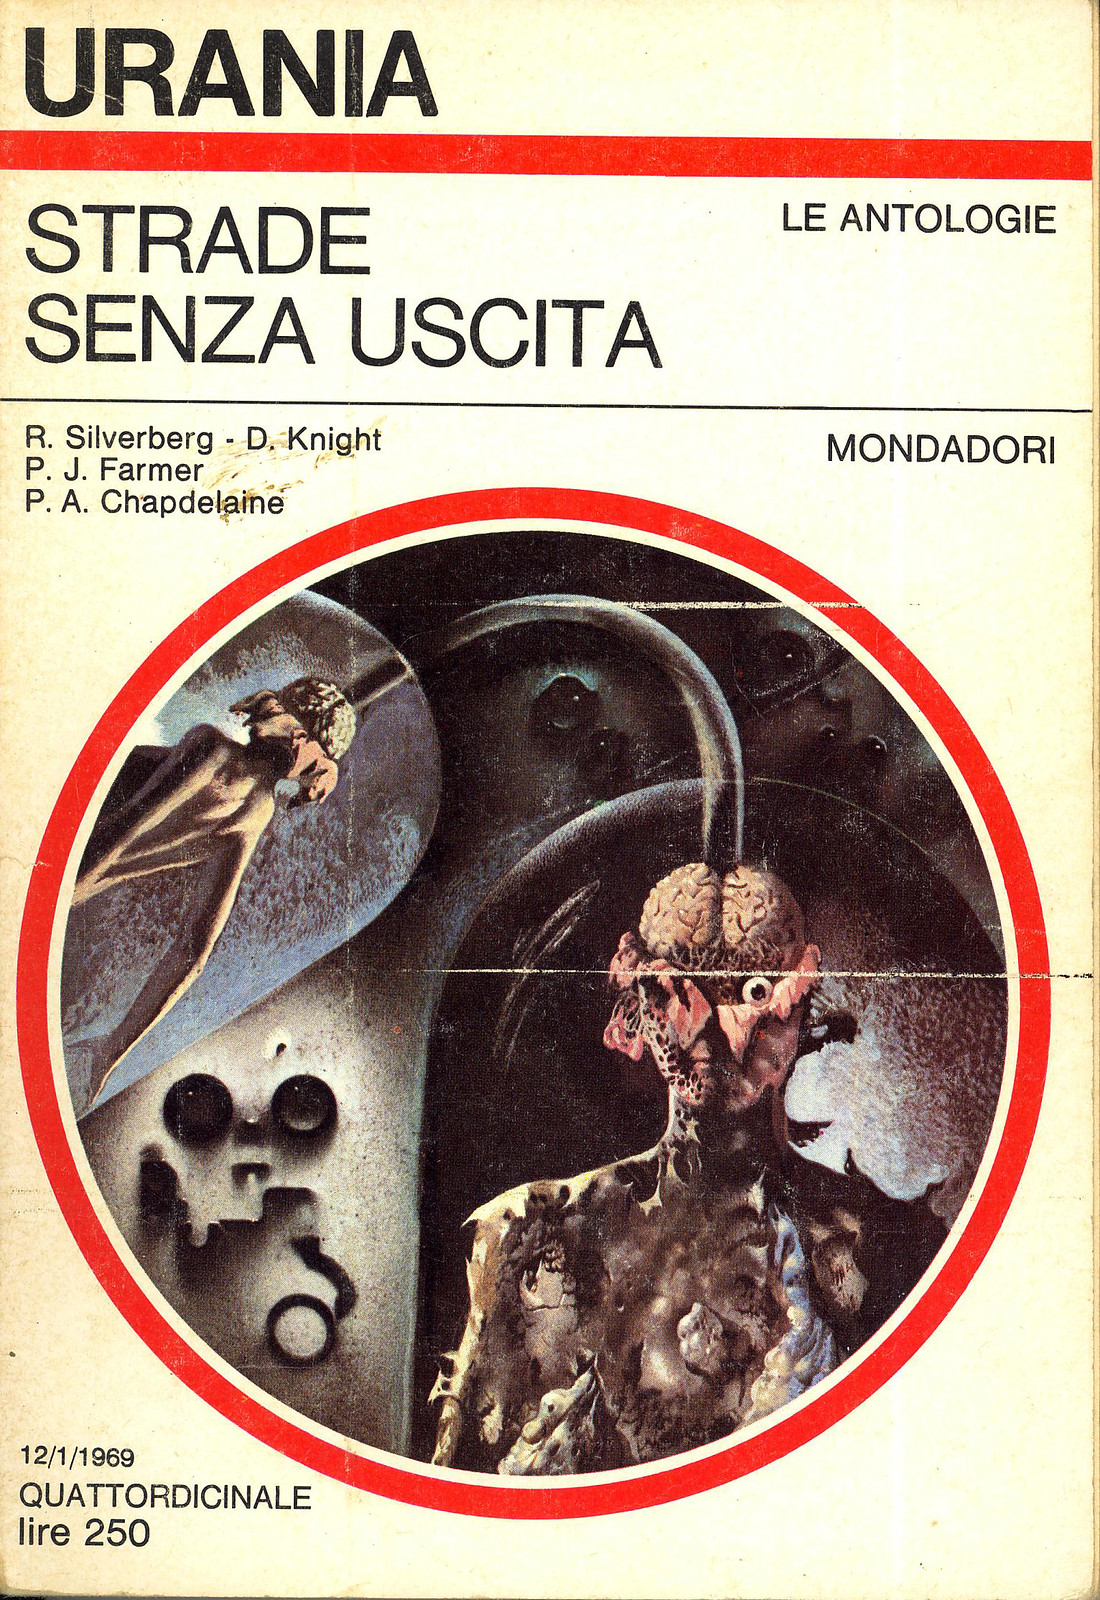 Karel Thole - URANIA - 505, 1969